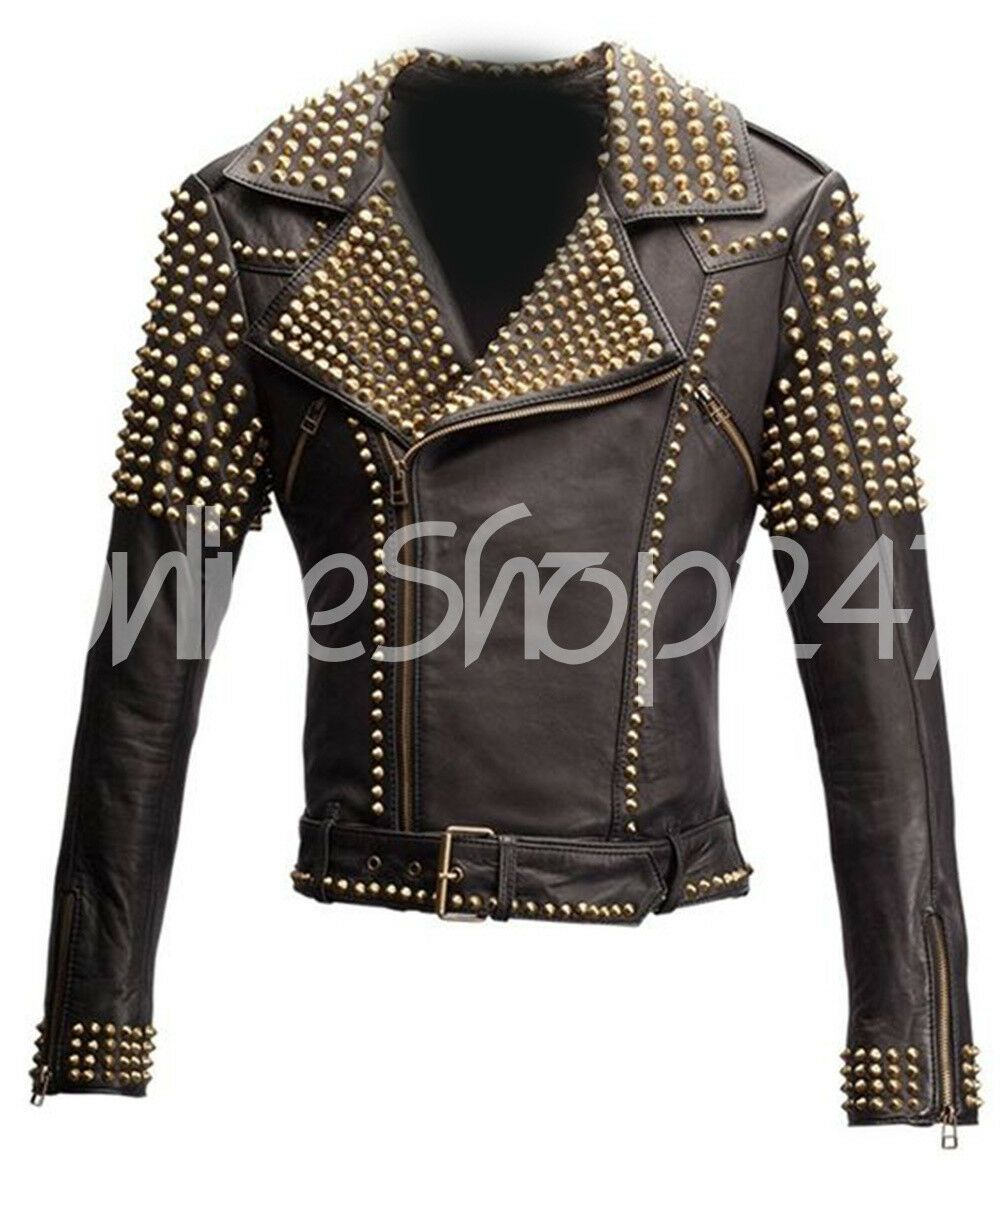 Women Black Gold Studded Studwork Handmade Studded Leather Jacket Biker Real Genuine Leadstyle New Leather Jacket Leather Jacket Black Biker Leather